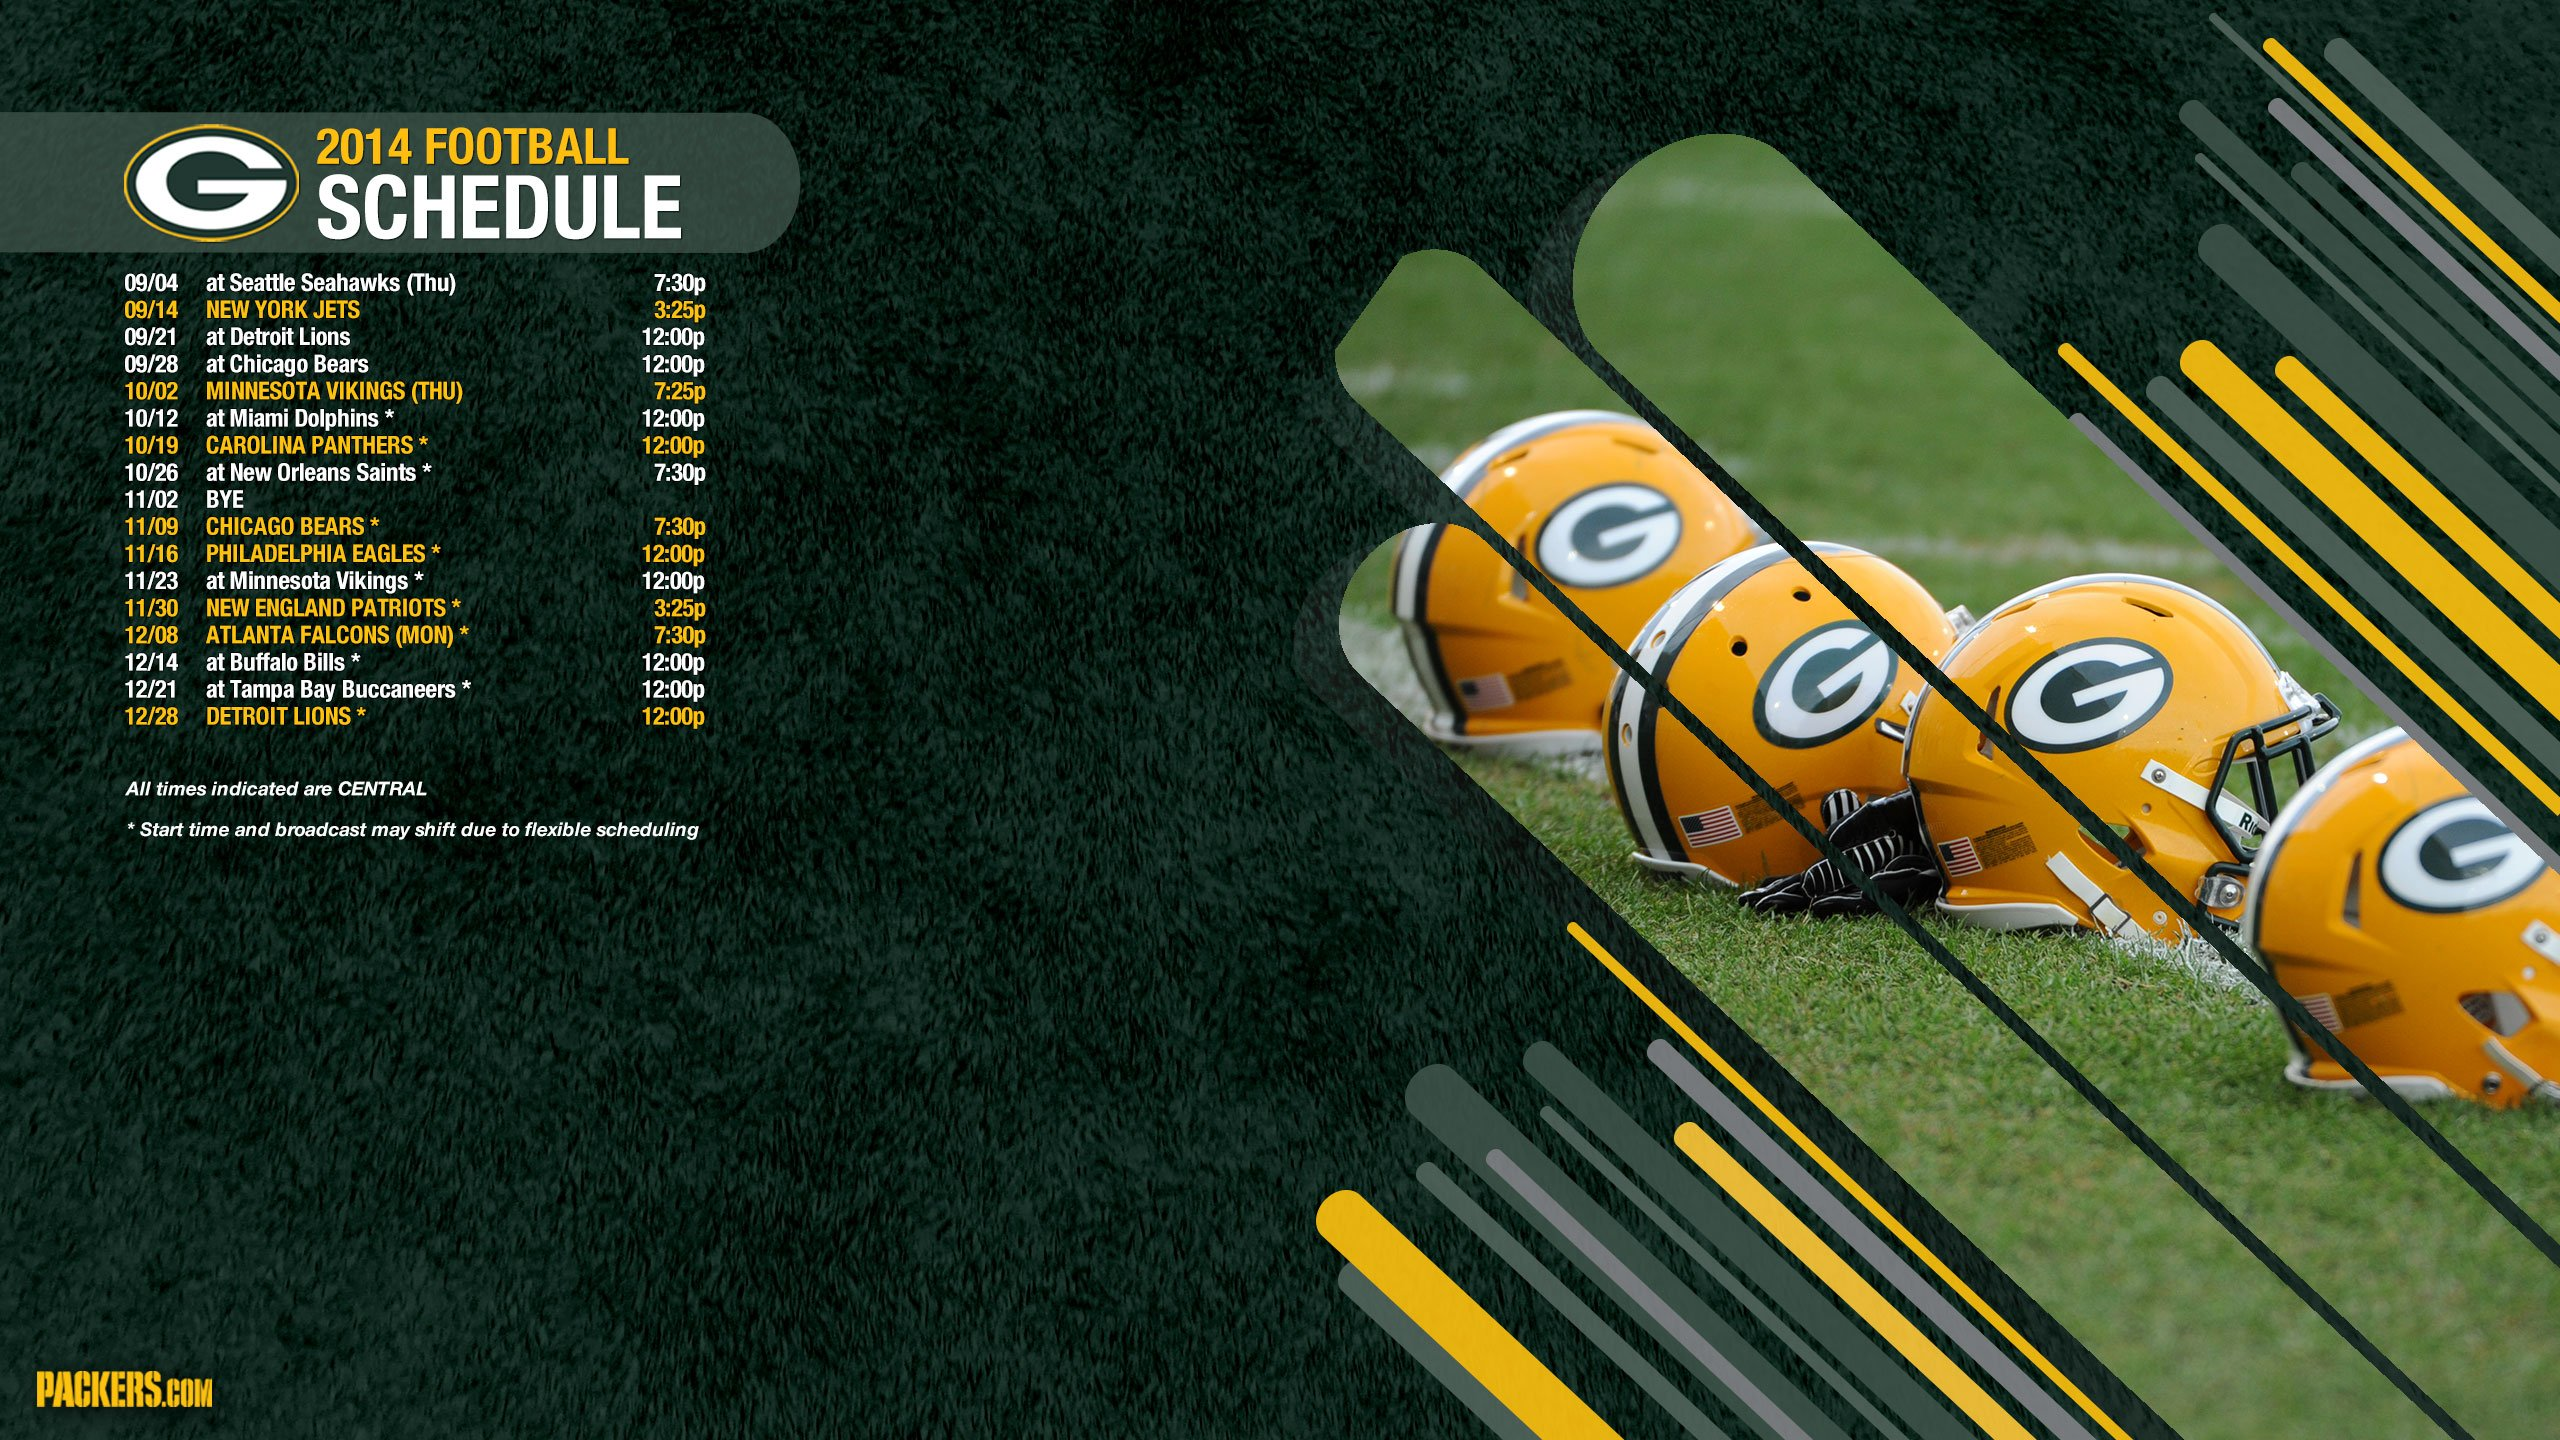 GREEN BAY PACKERS 2014 nfl football wallpaper 2560x1440 2560x1440